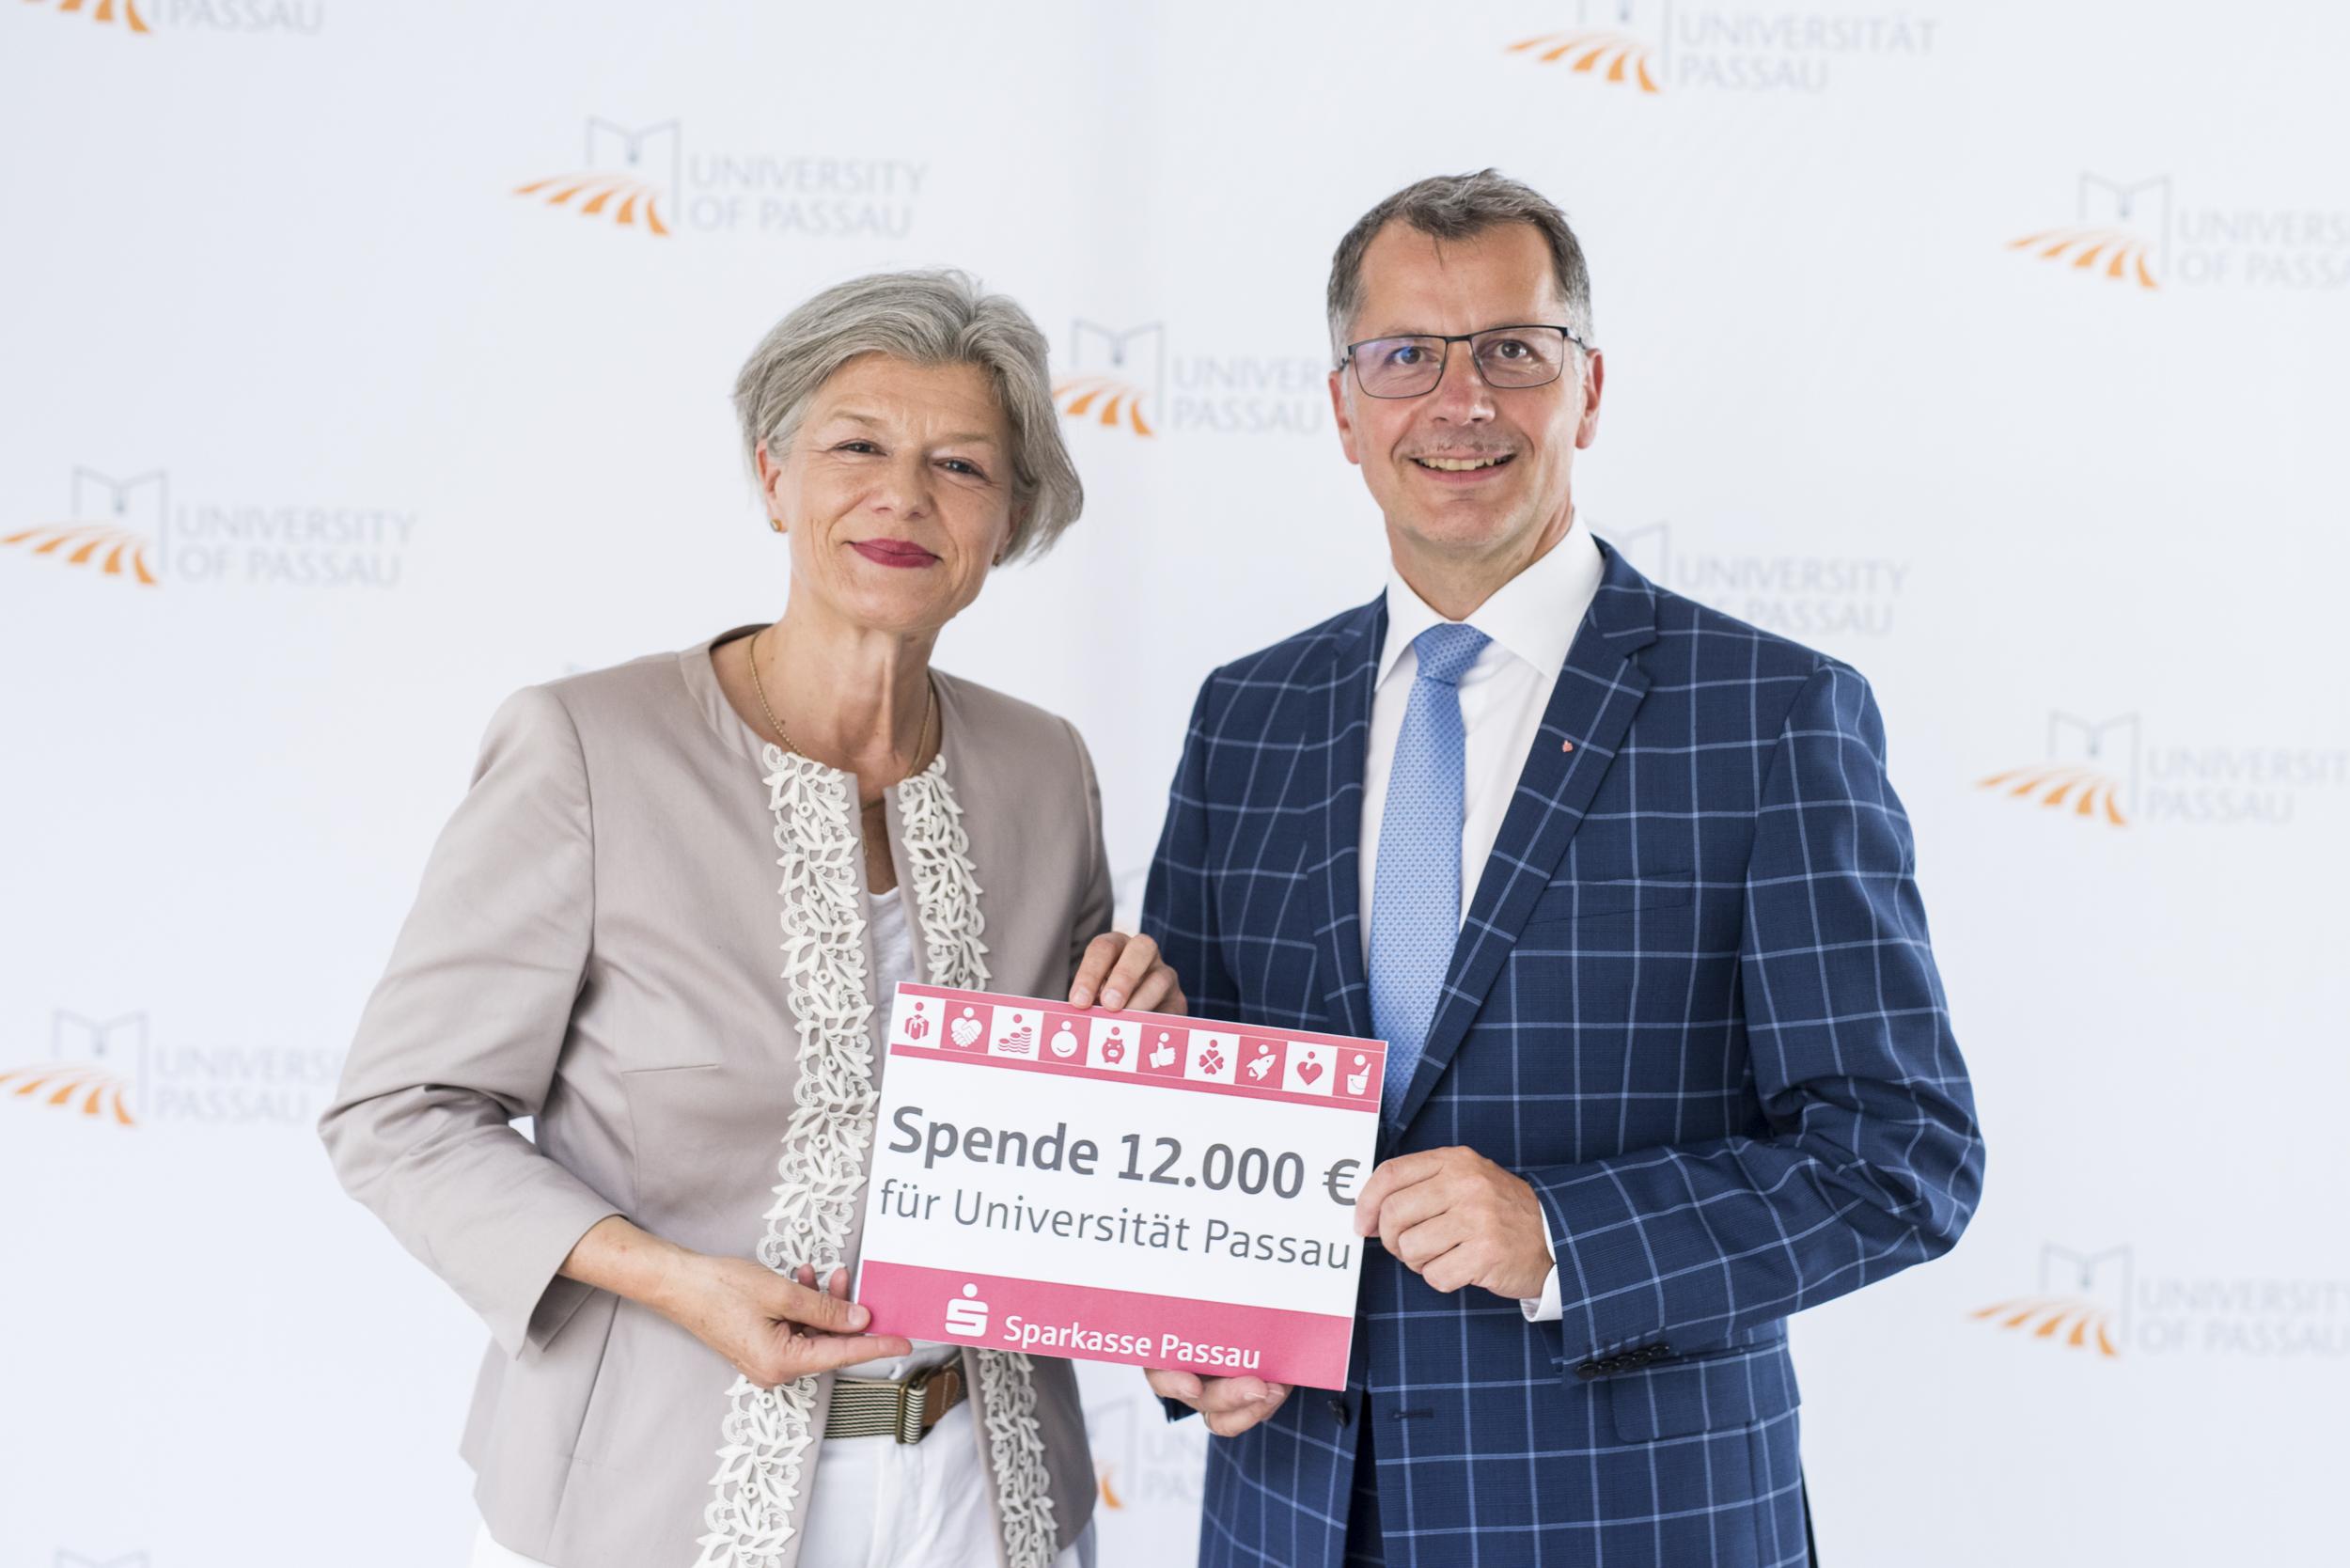 Sparkasse Passau fördert die Universität